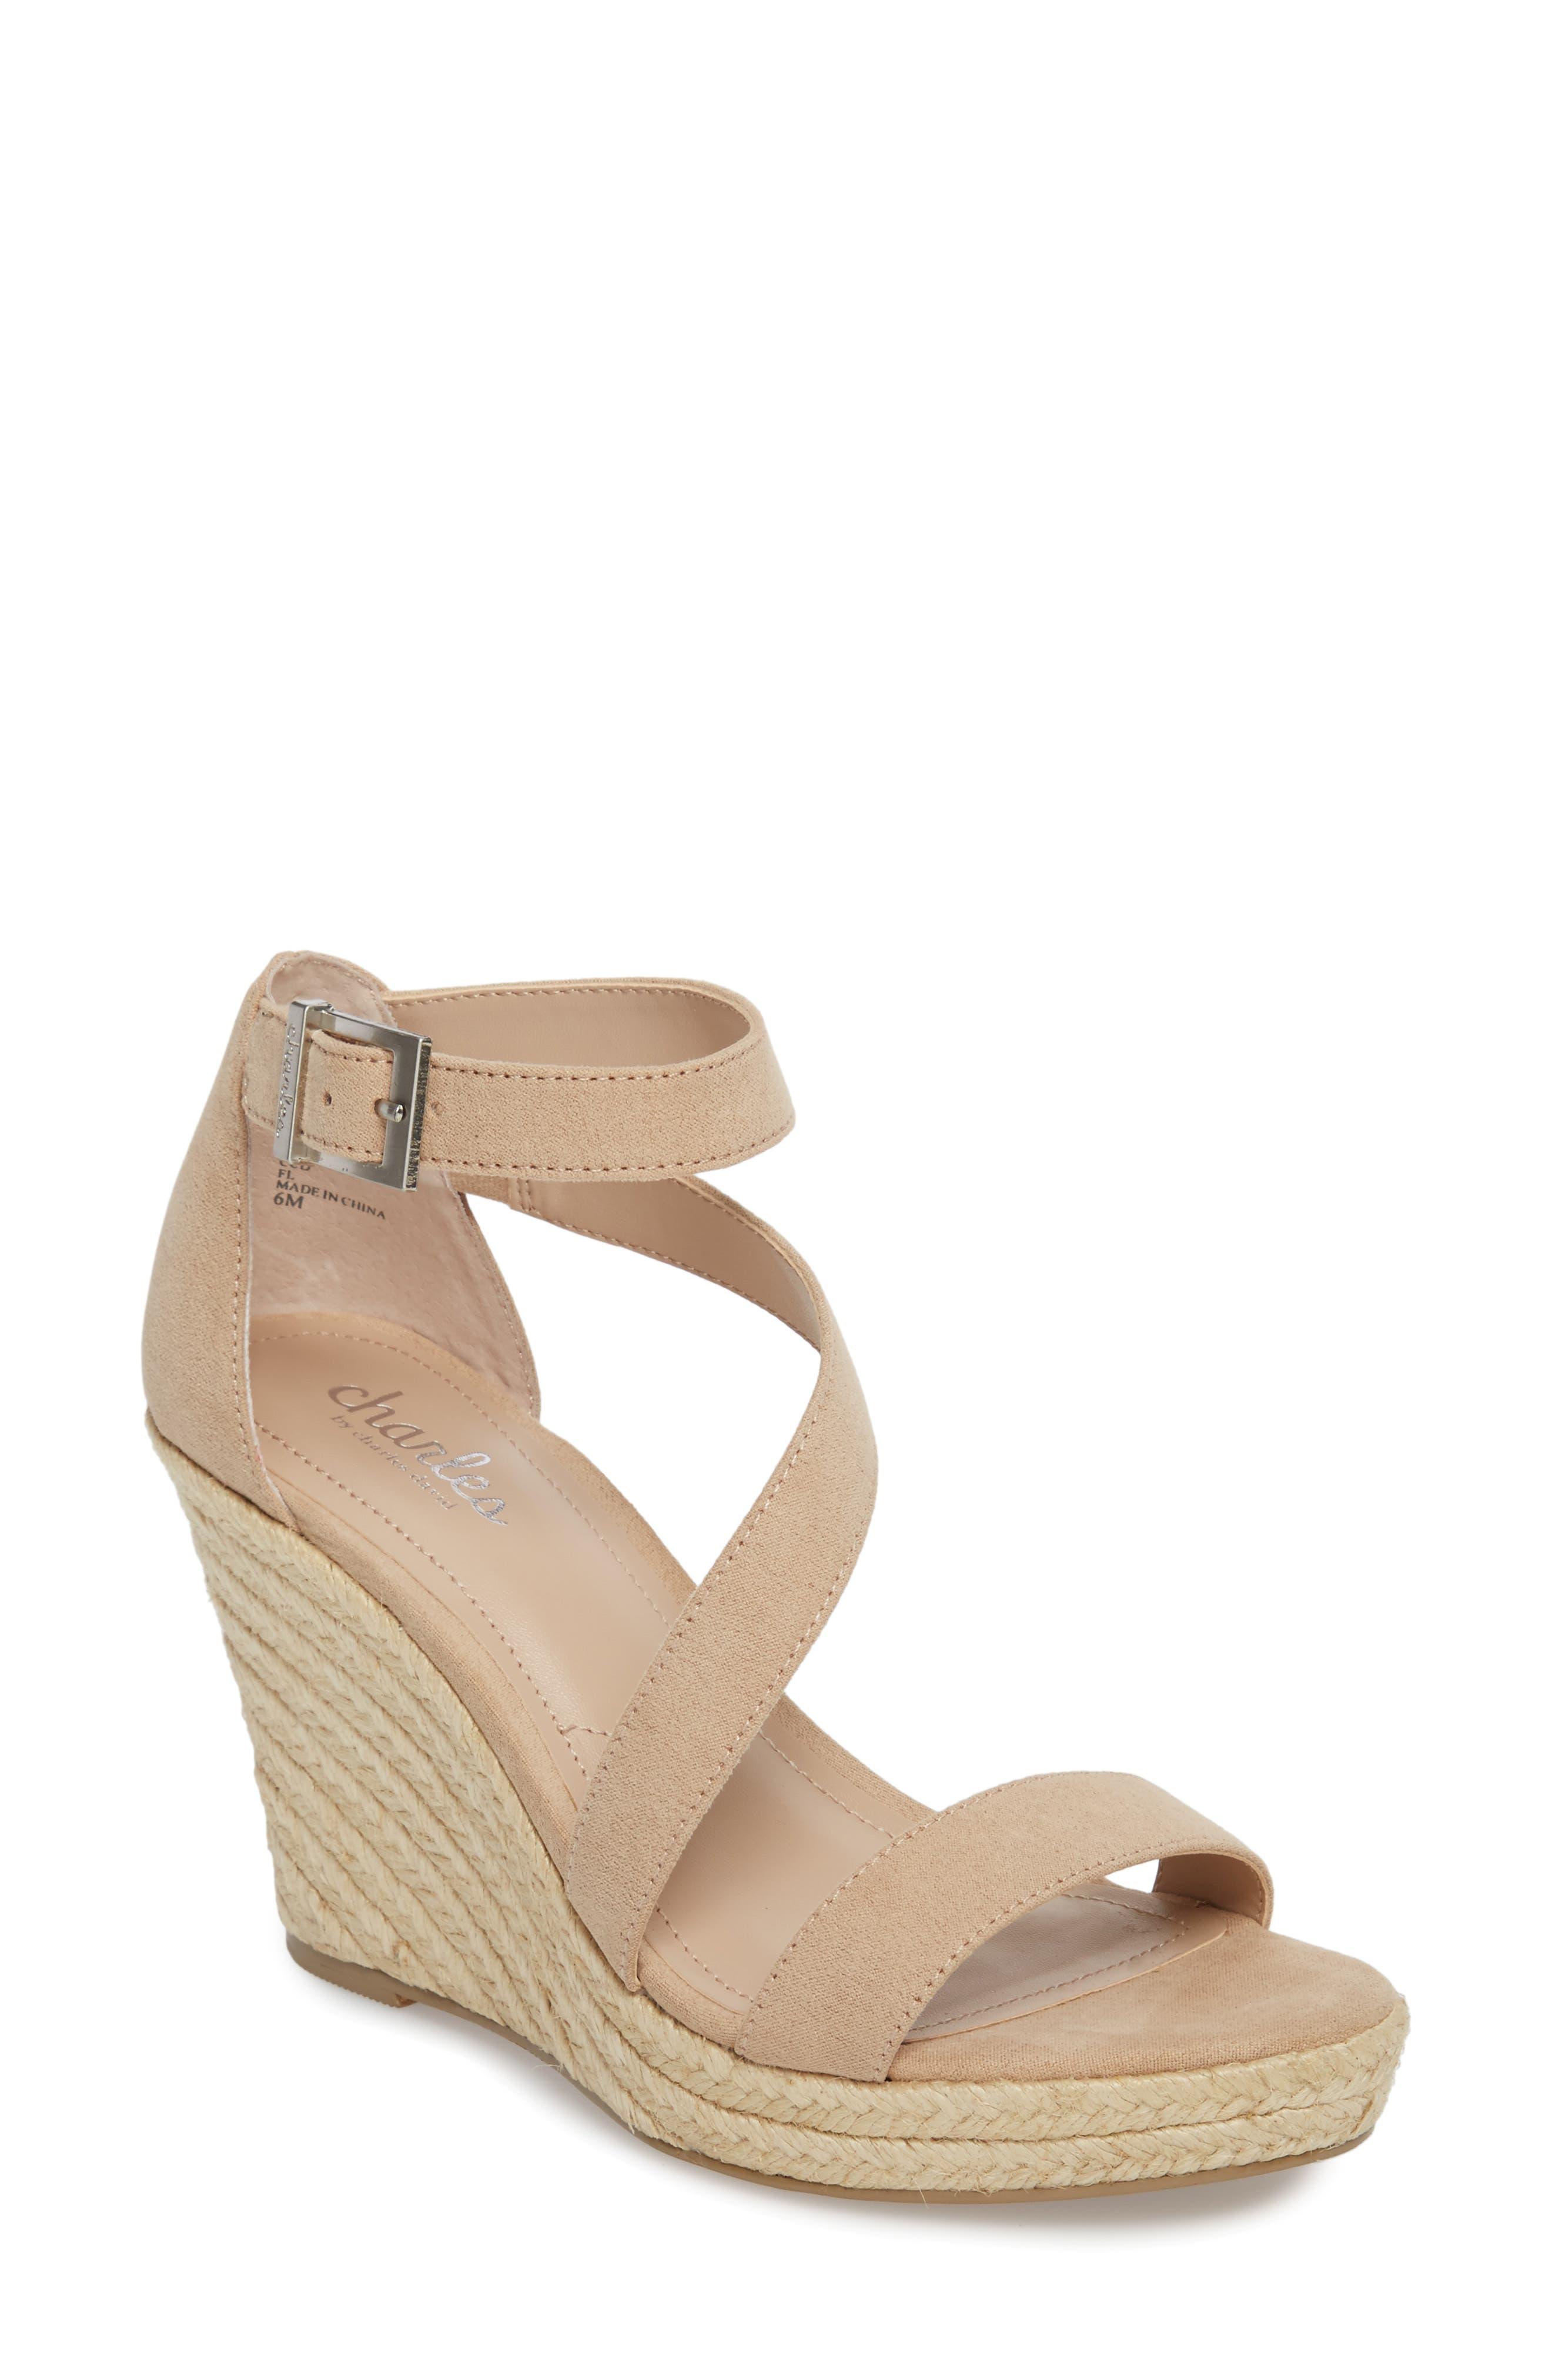 Lou Asymmetrical Wedge Sandal,                         Main,                         color, Nude Suede